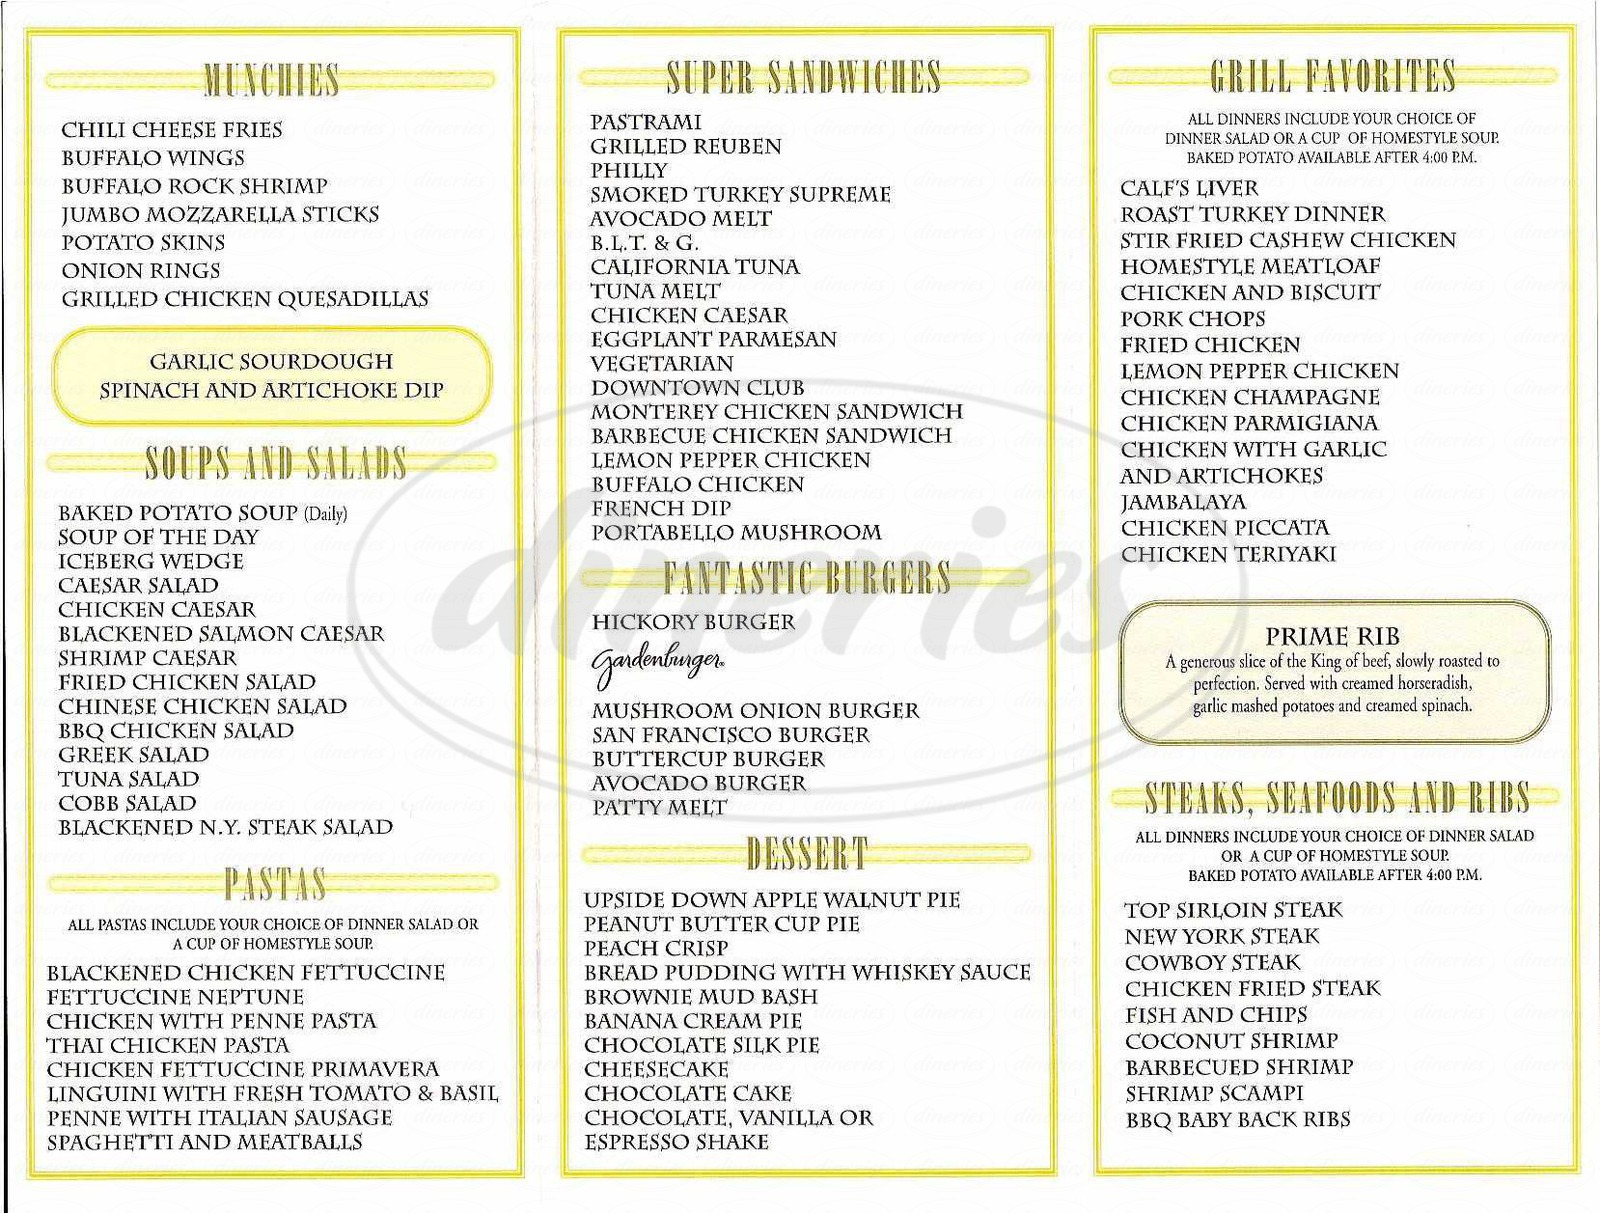 menu for Buttercup Grill & Bar